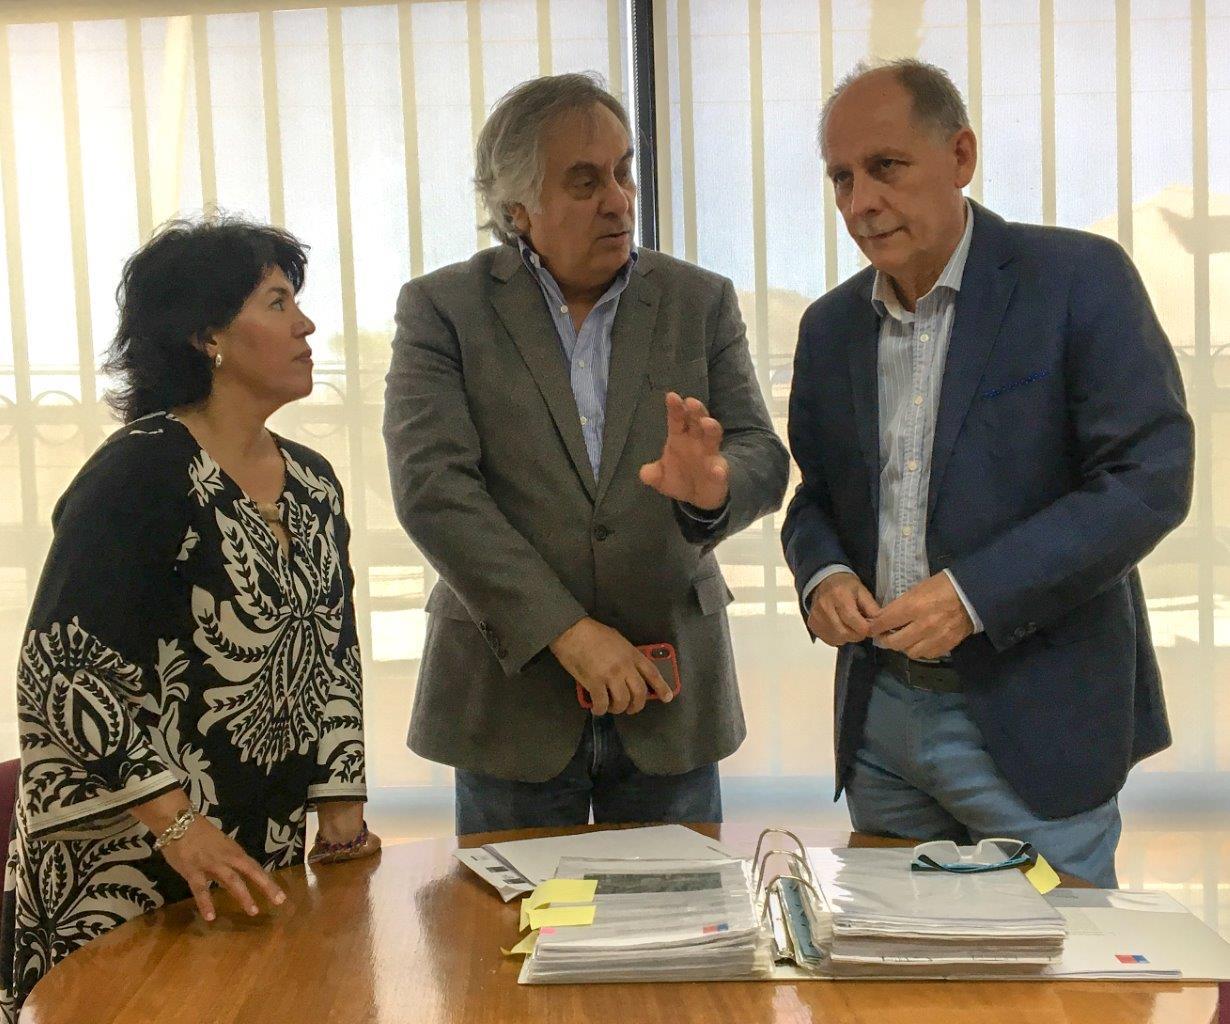 Senadores Prohens y Provoste junto a seremi Minvu revisan cartera de proyectos para Atacama